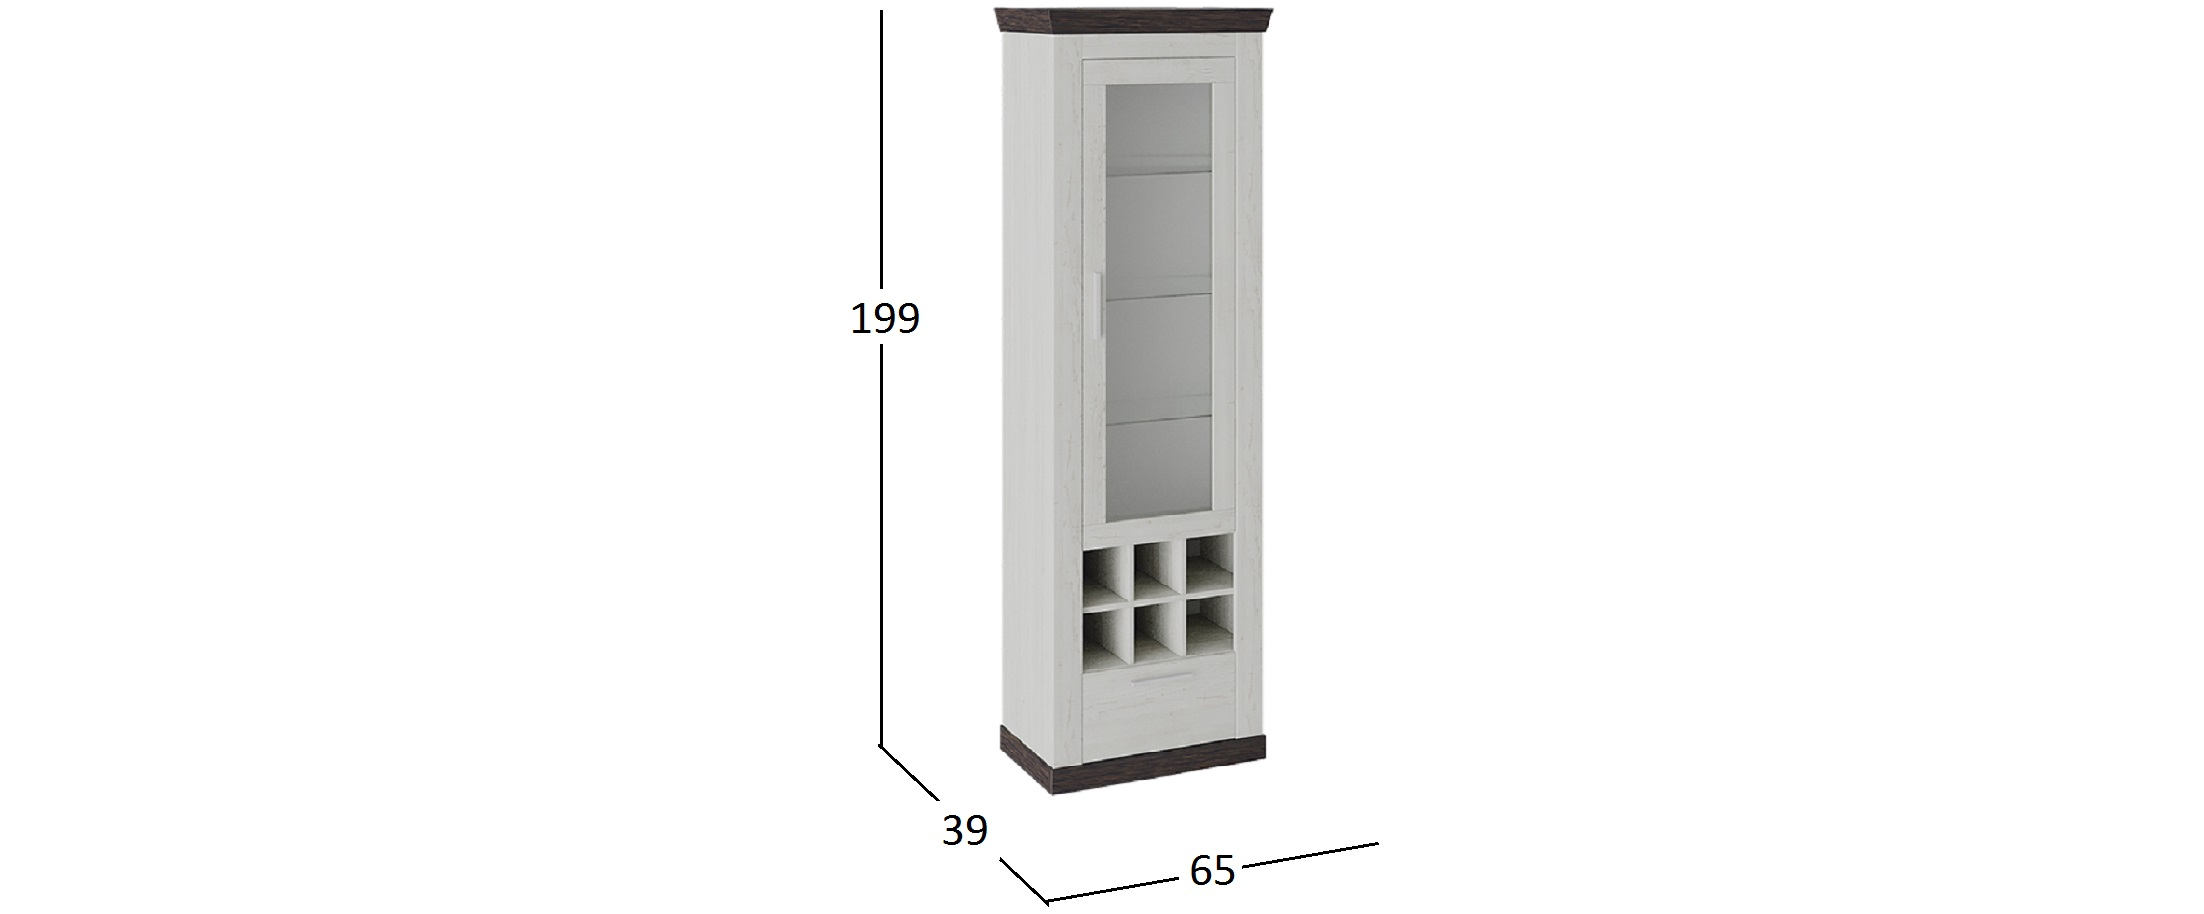 Шкаф Витрина Поланд Тип 1 Модель 941